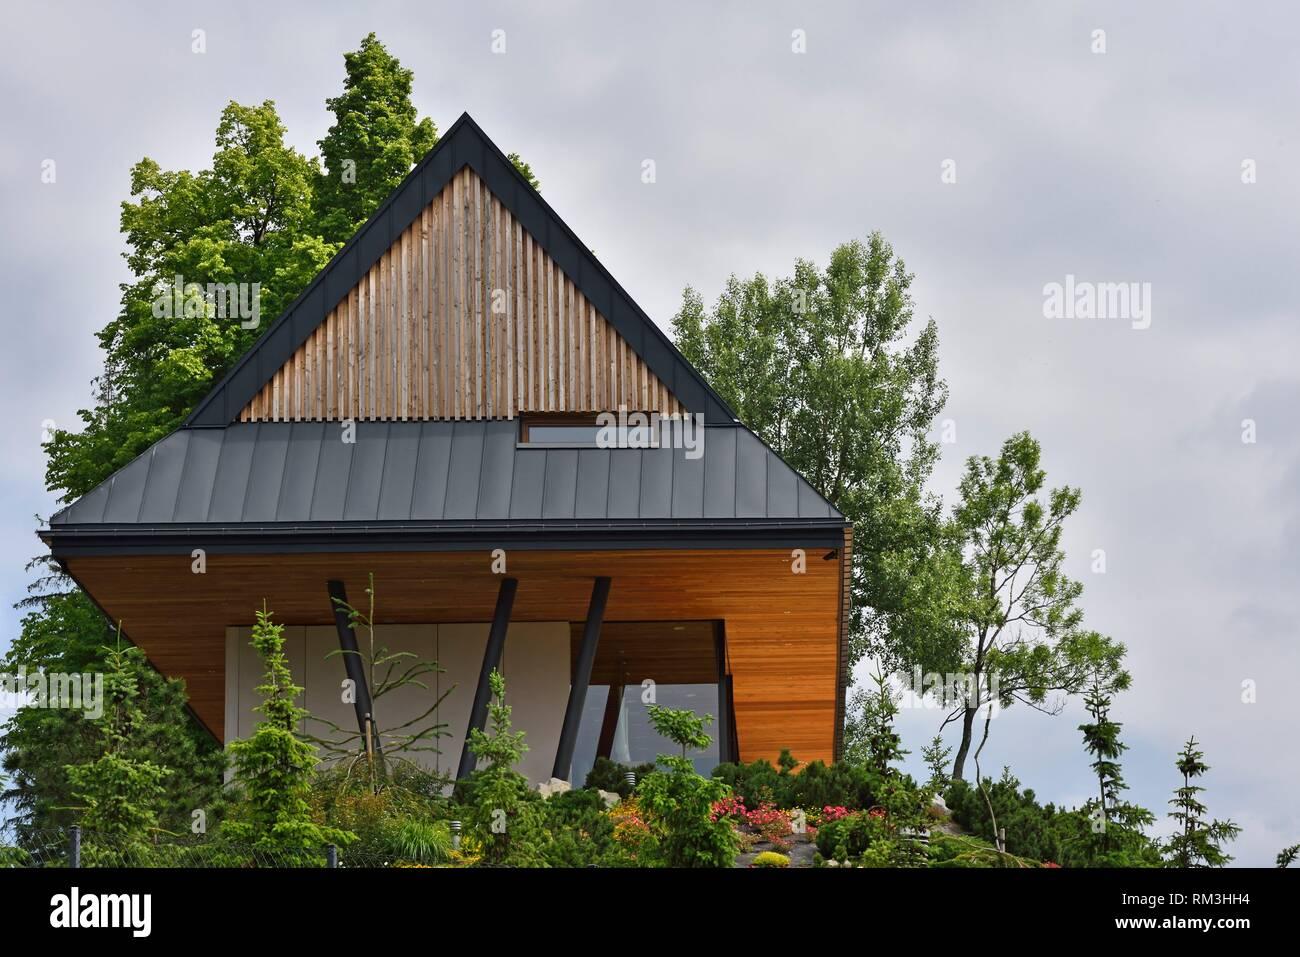 Maison Bois Stockfotos & Maison Bois Bilder - Alamy